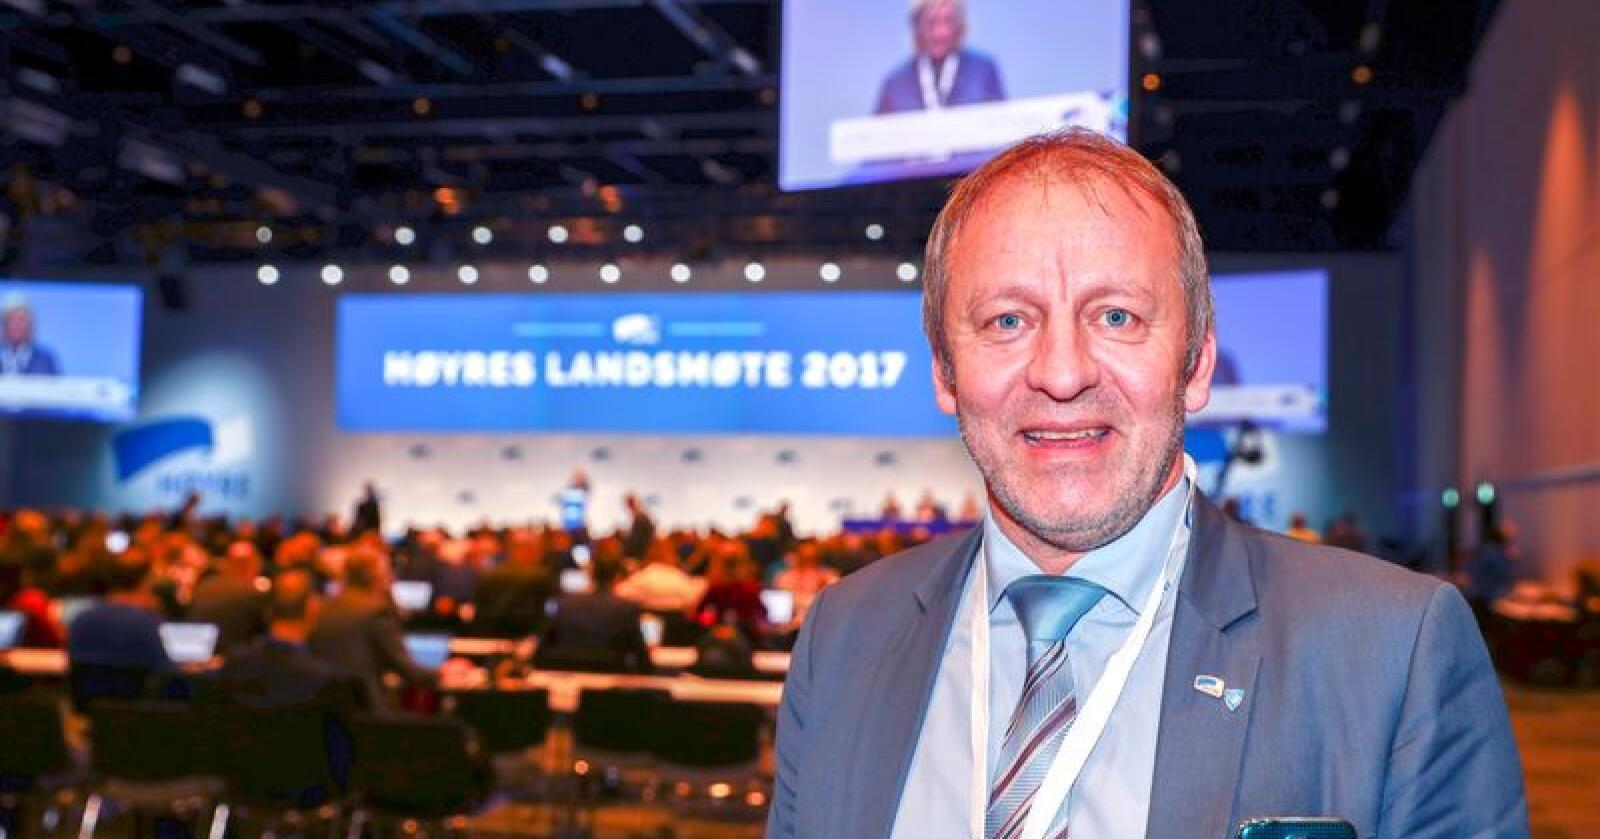 Geir Inge Sivertsen blir ny statssekretær i Næringsdepartementet. Foto: Terje Pedersen / NTB scanpix